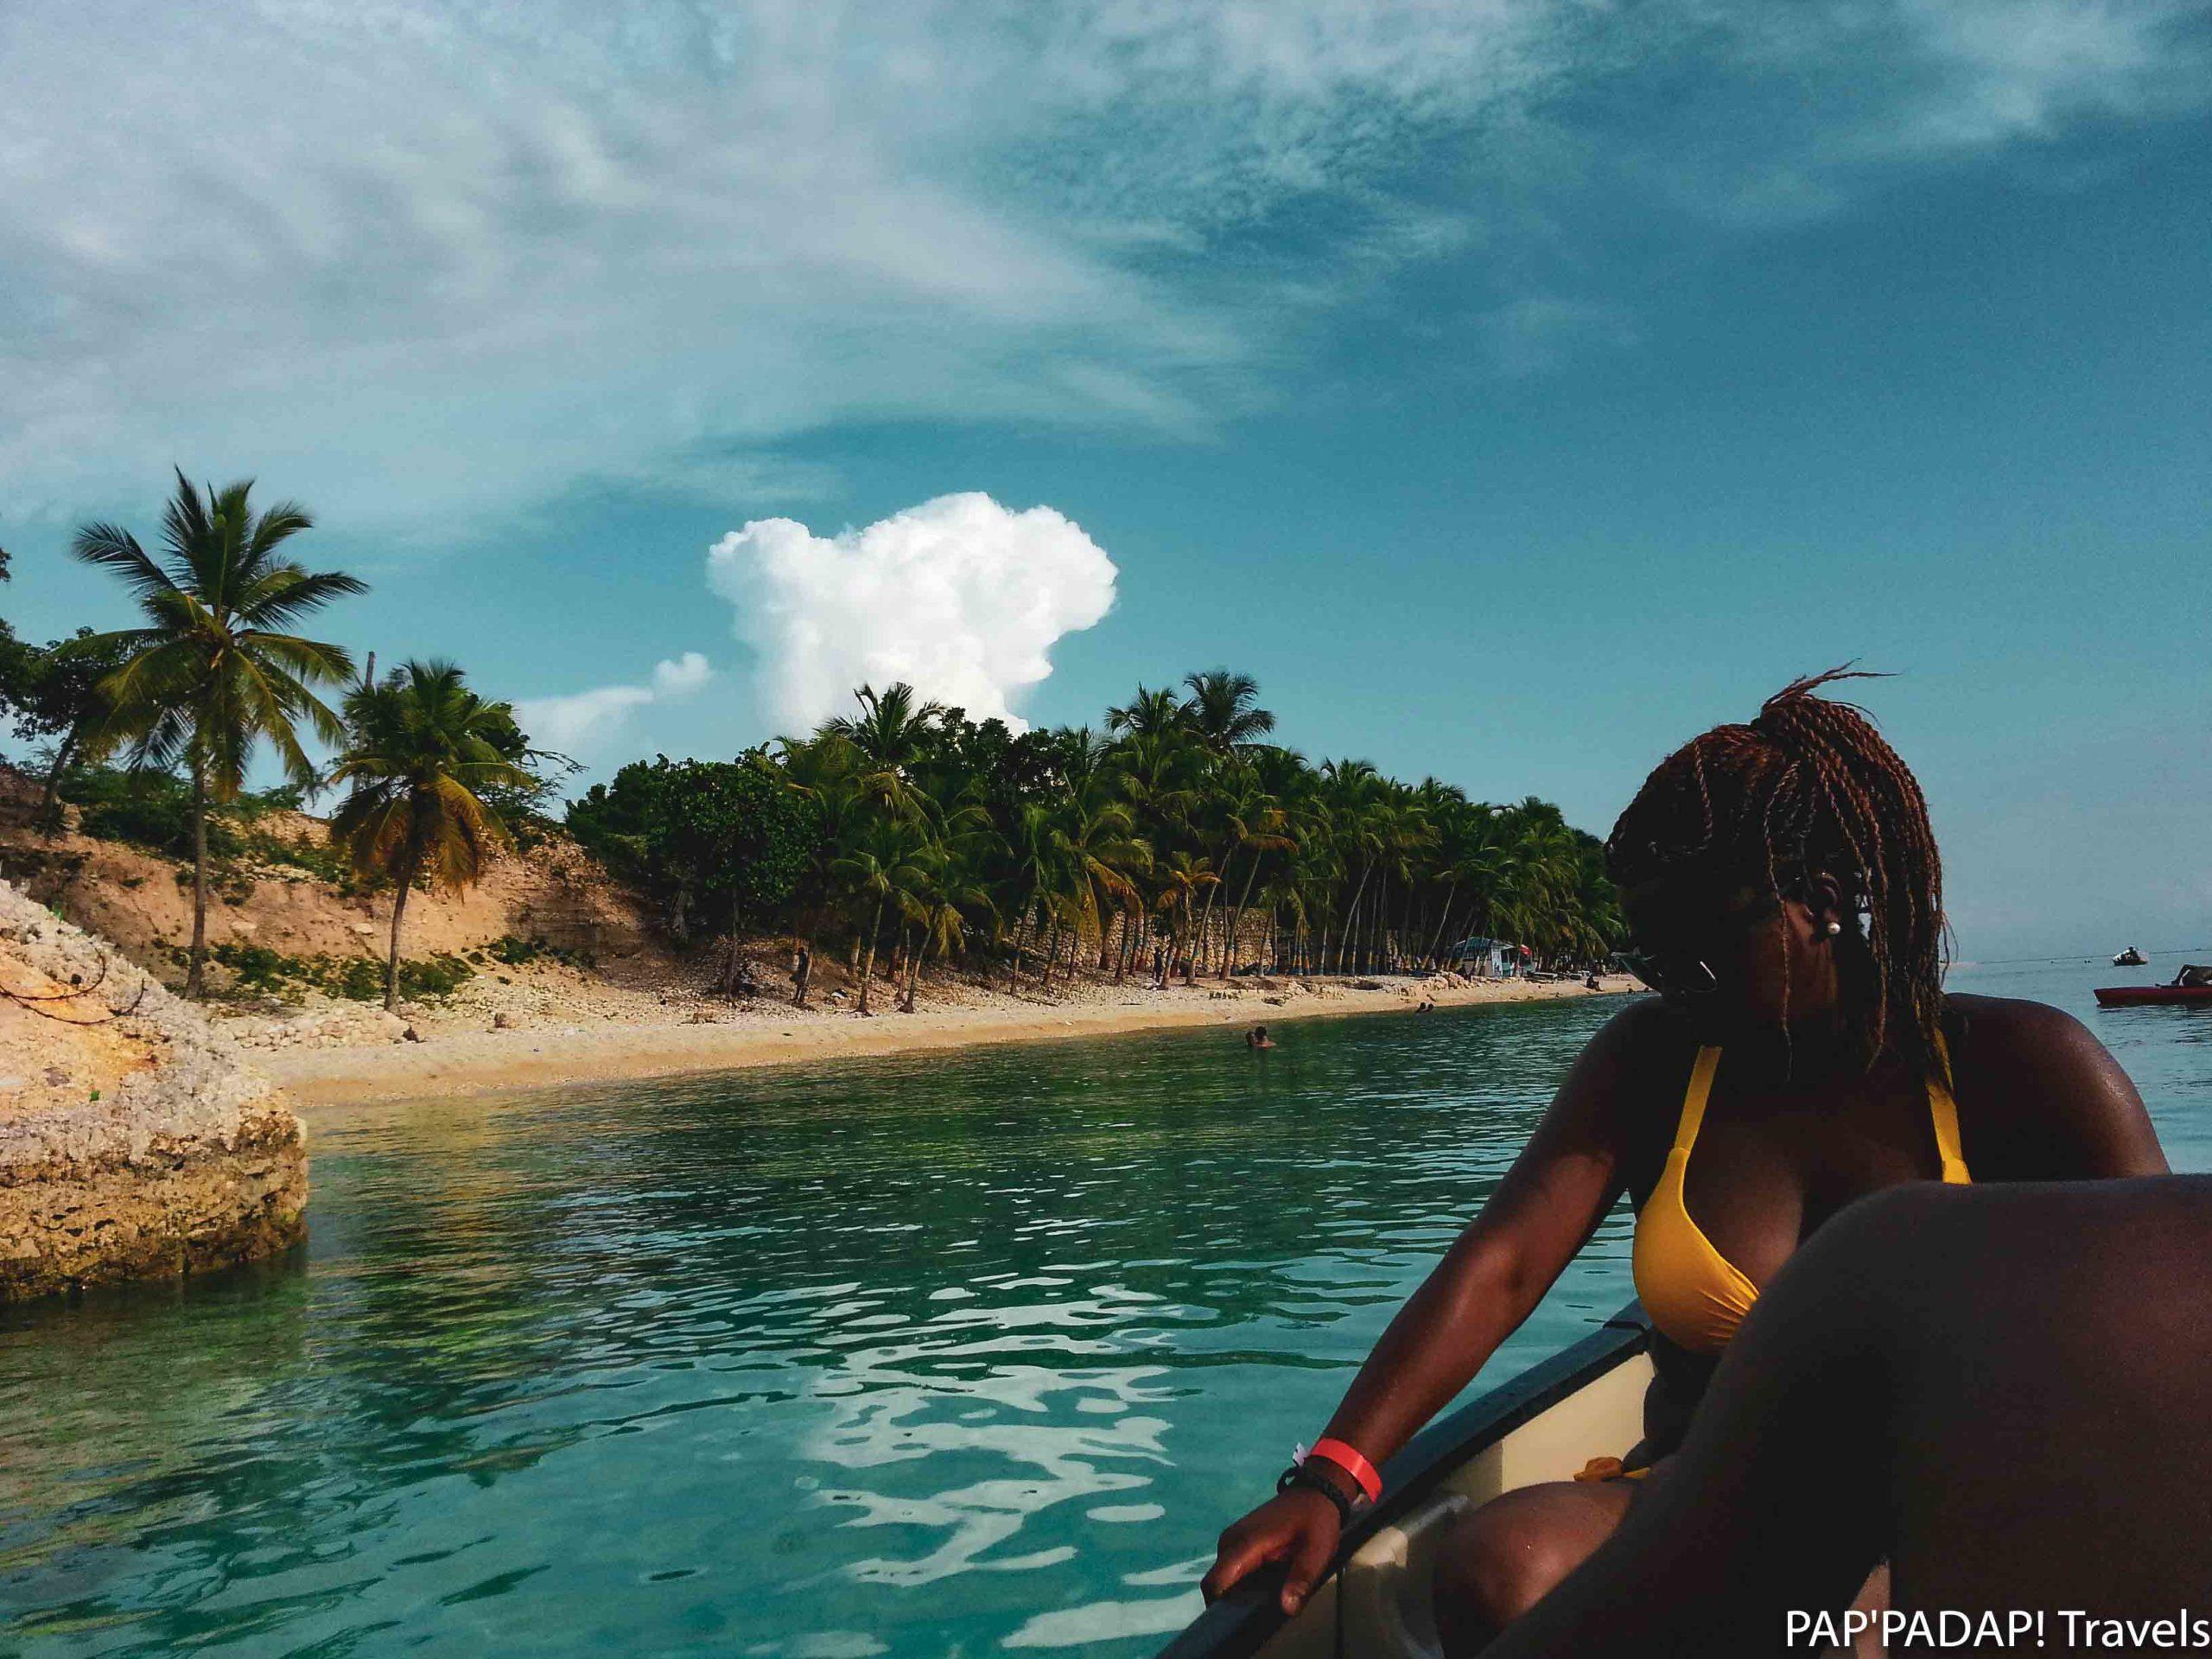 Voyageurs barque - plage Arcahaie - Haïti - PAP_PADAP! Travels